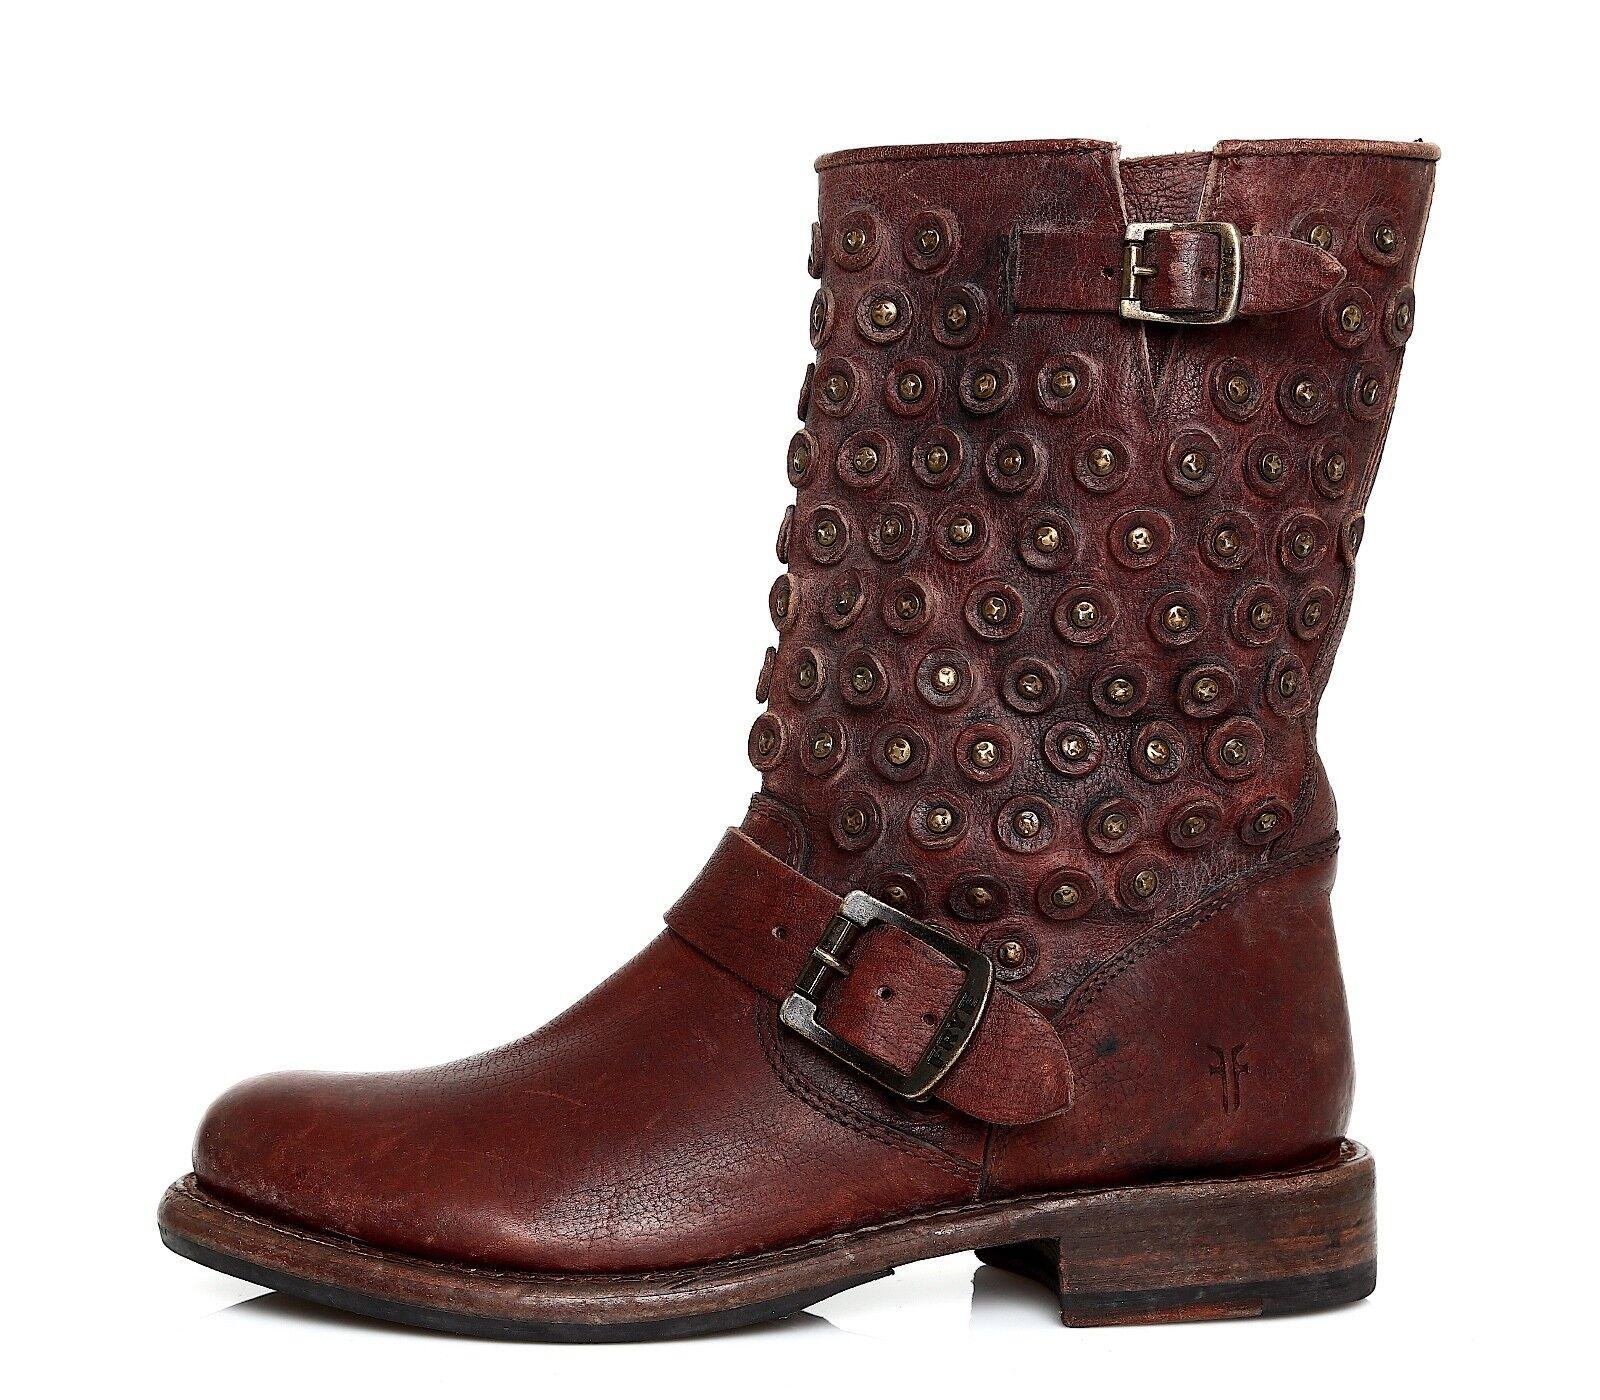 Frye Jenna Disc Short Leather Stiefel braun damen Sz  5.5 B 5947  Sz 90afb6